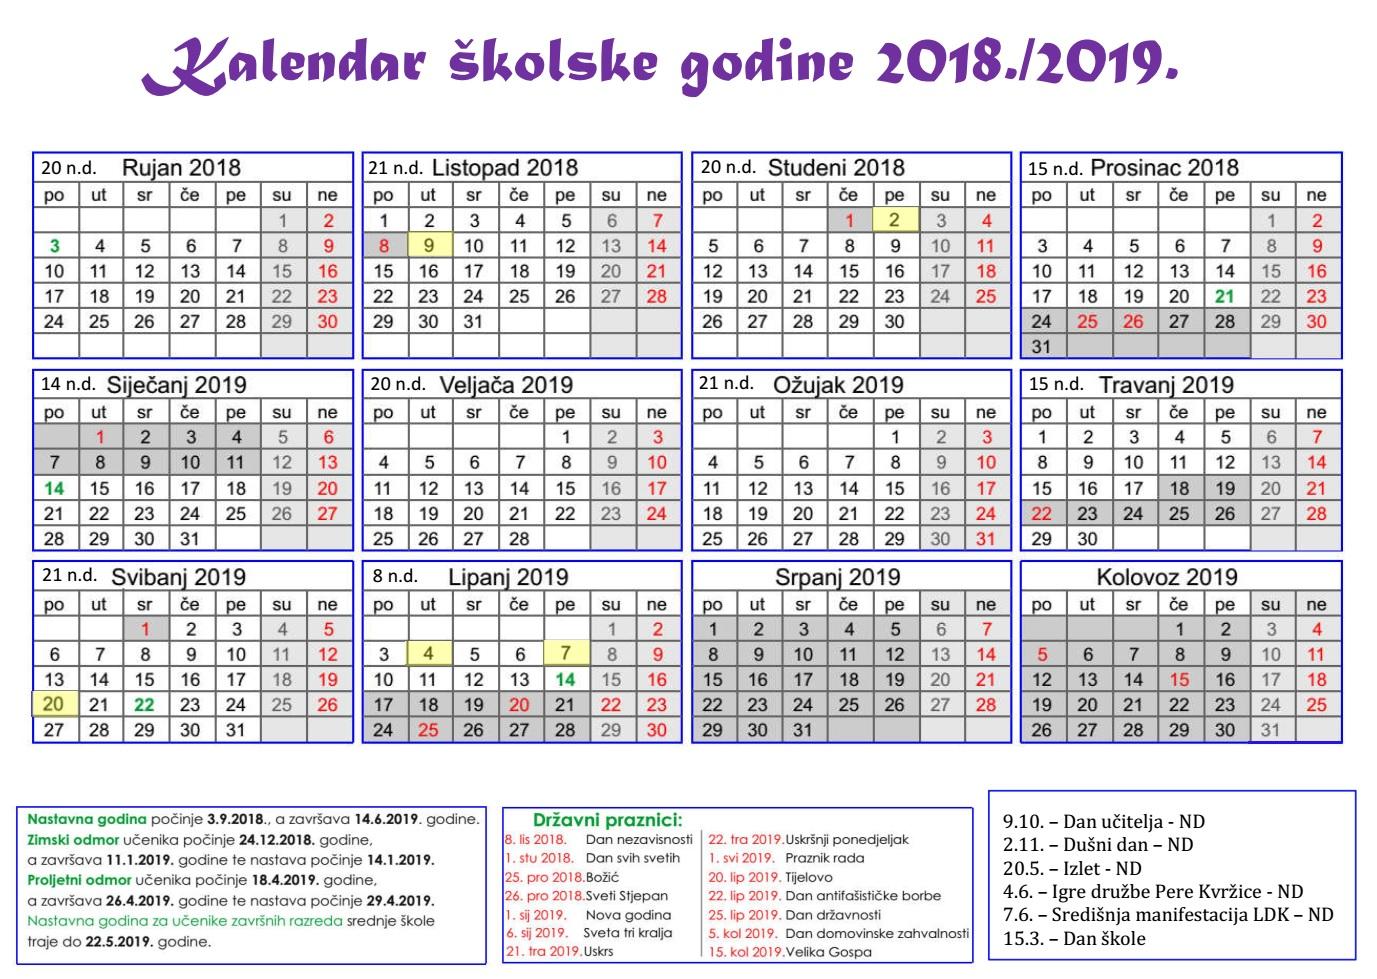 e9d7f2a932 Osnovna škola Mate Lovraka Veliki Grđevac - Kalendar rada